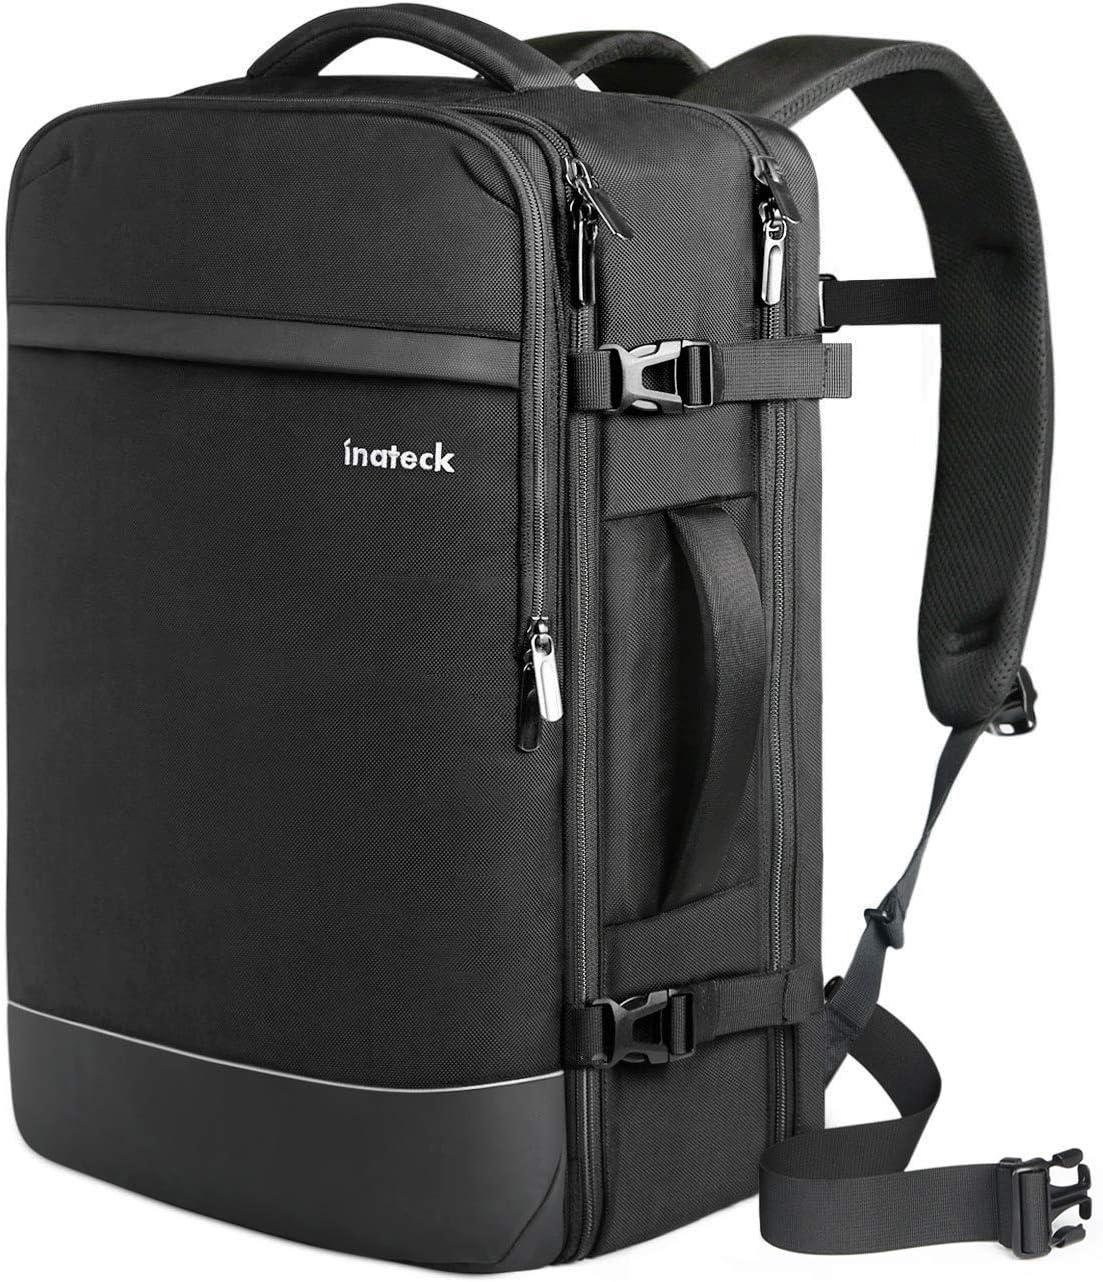 Inateck - Mochila de Viaje (40 L, antirrobo, para portátiles de 15,6/17/17,3 Pulgadas, Travel Carry On Backpack, Mochila de Cabina Equipaje de Cabina